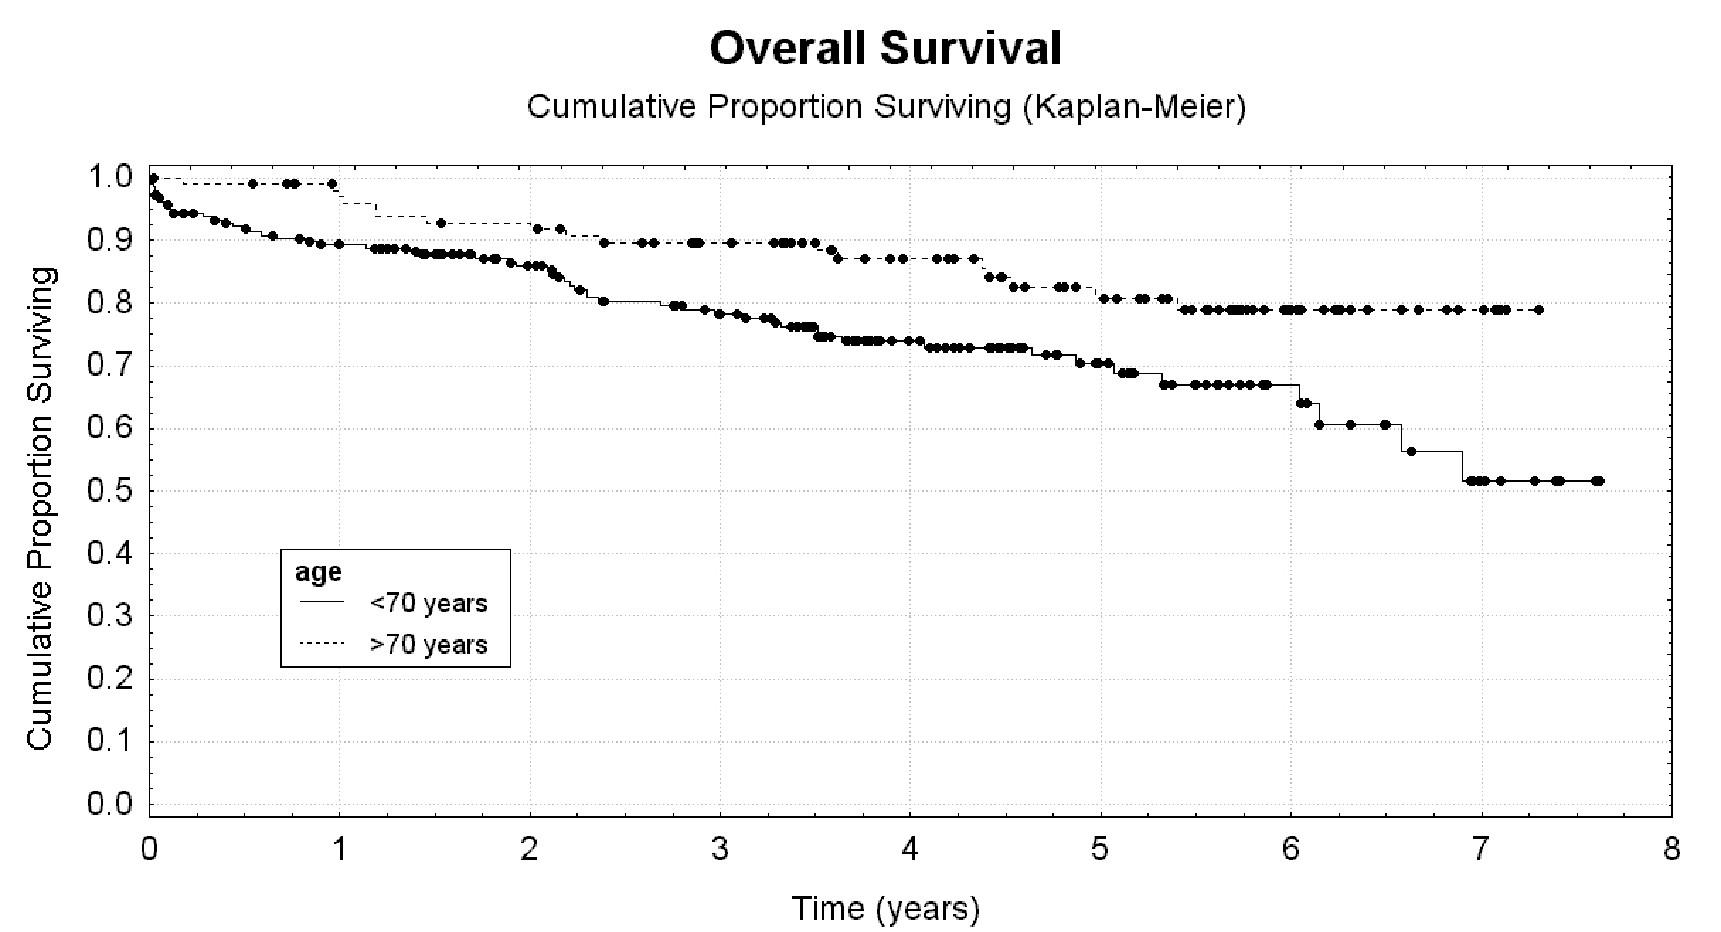 Věk jako rizikový faktor úmrtí, cut off 70 let Graph 1: Age as a risk factor for death, cut off 70 years